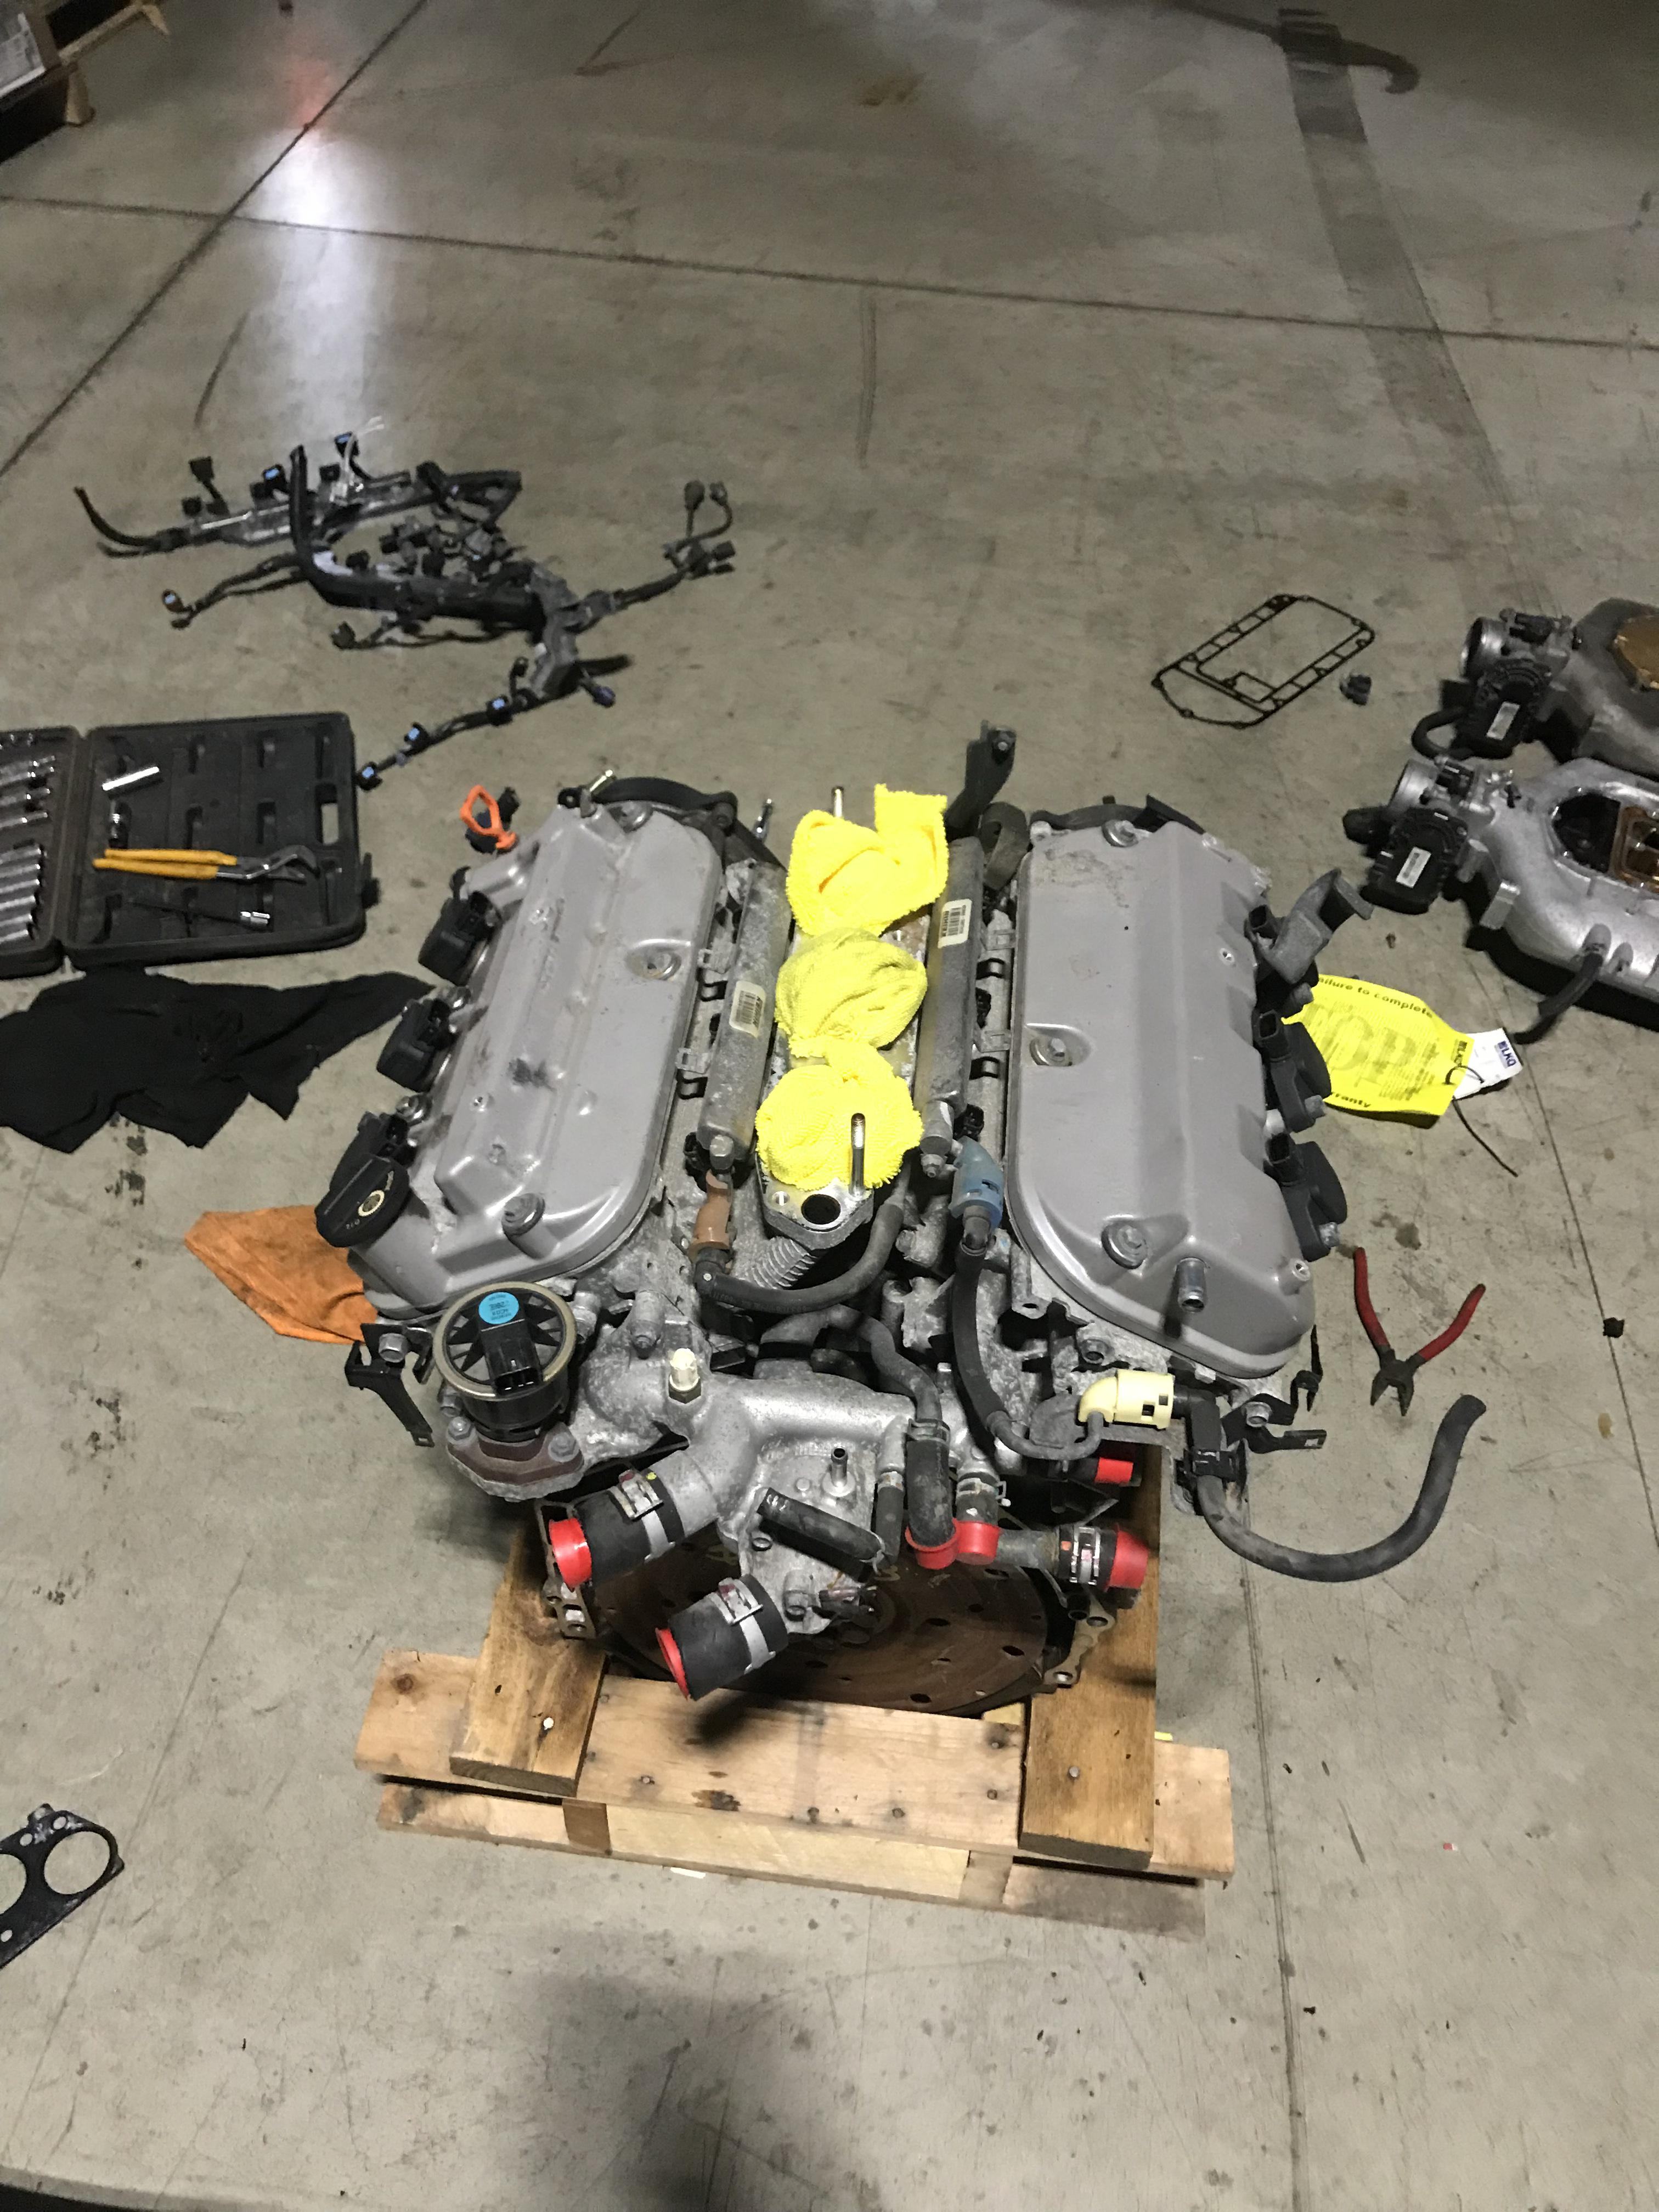 3.2 TL motor swapped success-64292392-f9fe-49ae-bc6c-10dcddb87a92_1529000143530.jpeg